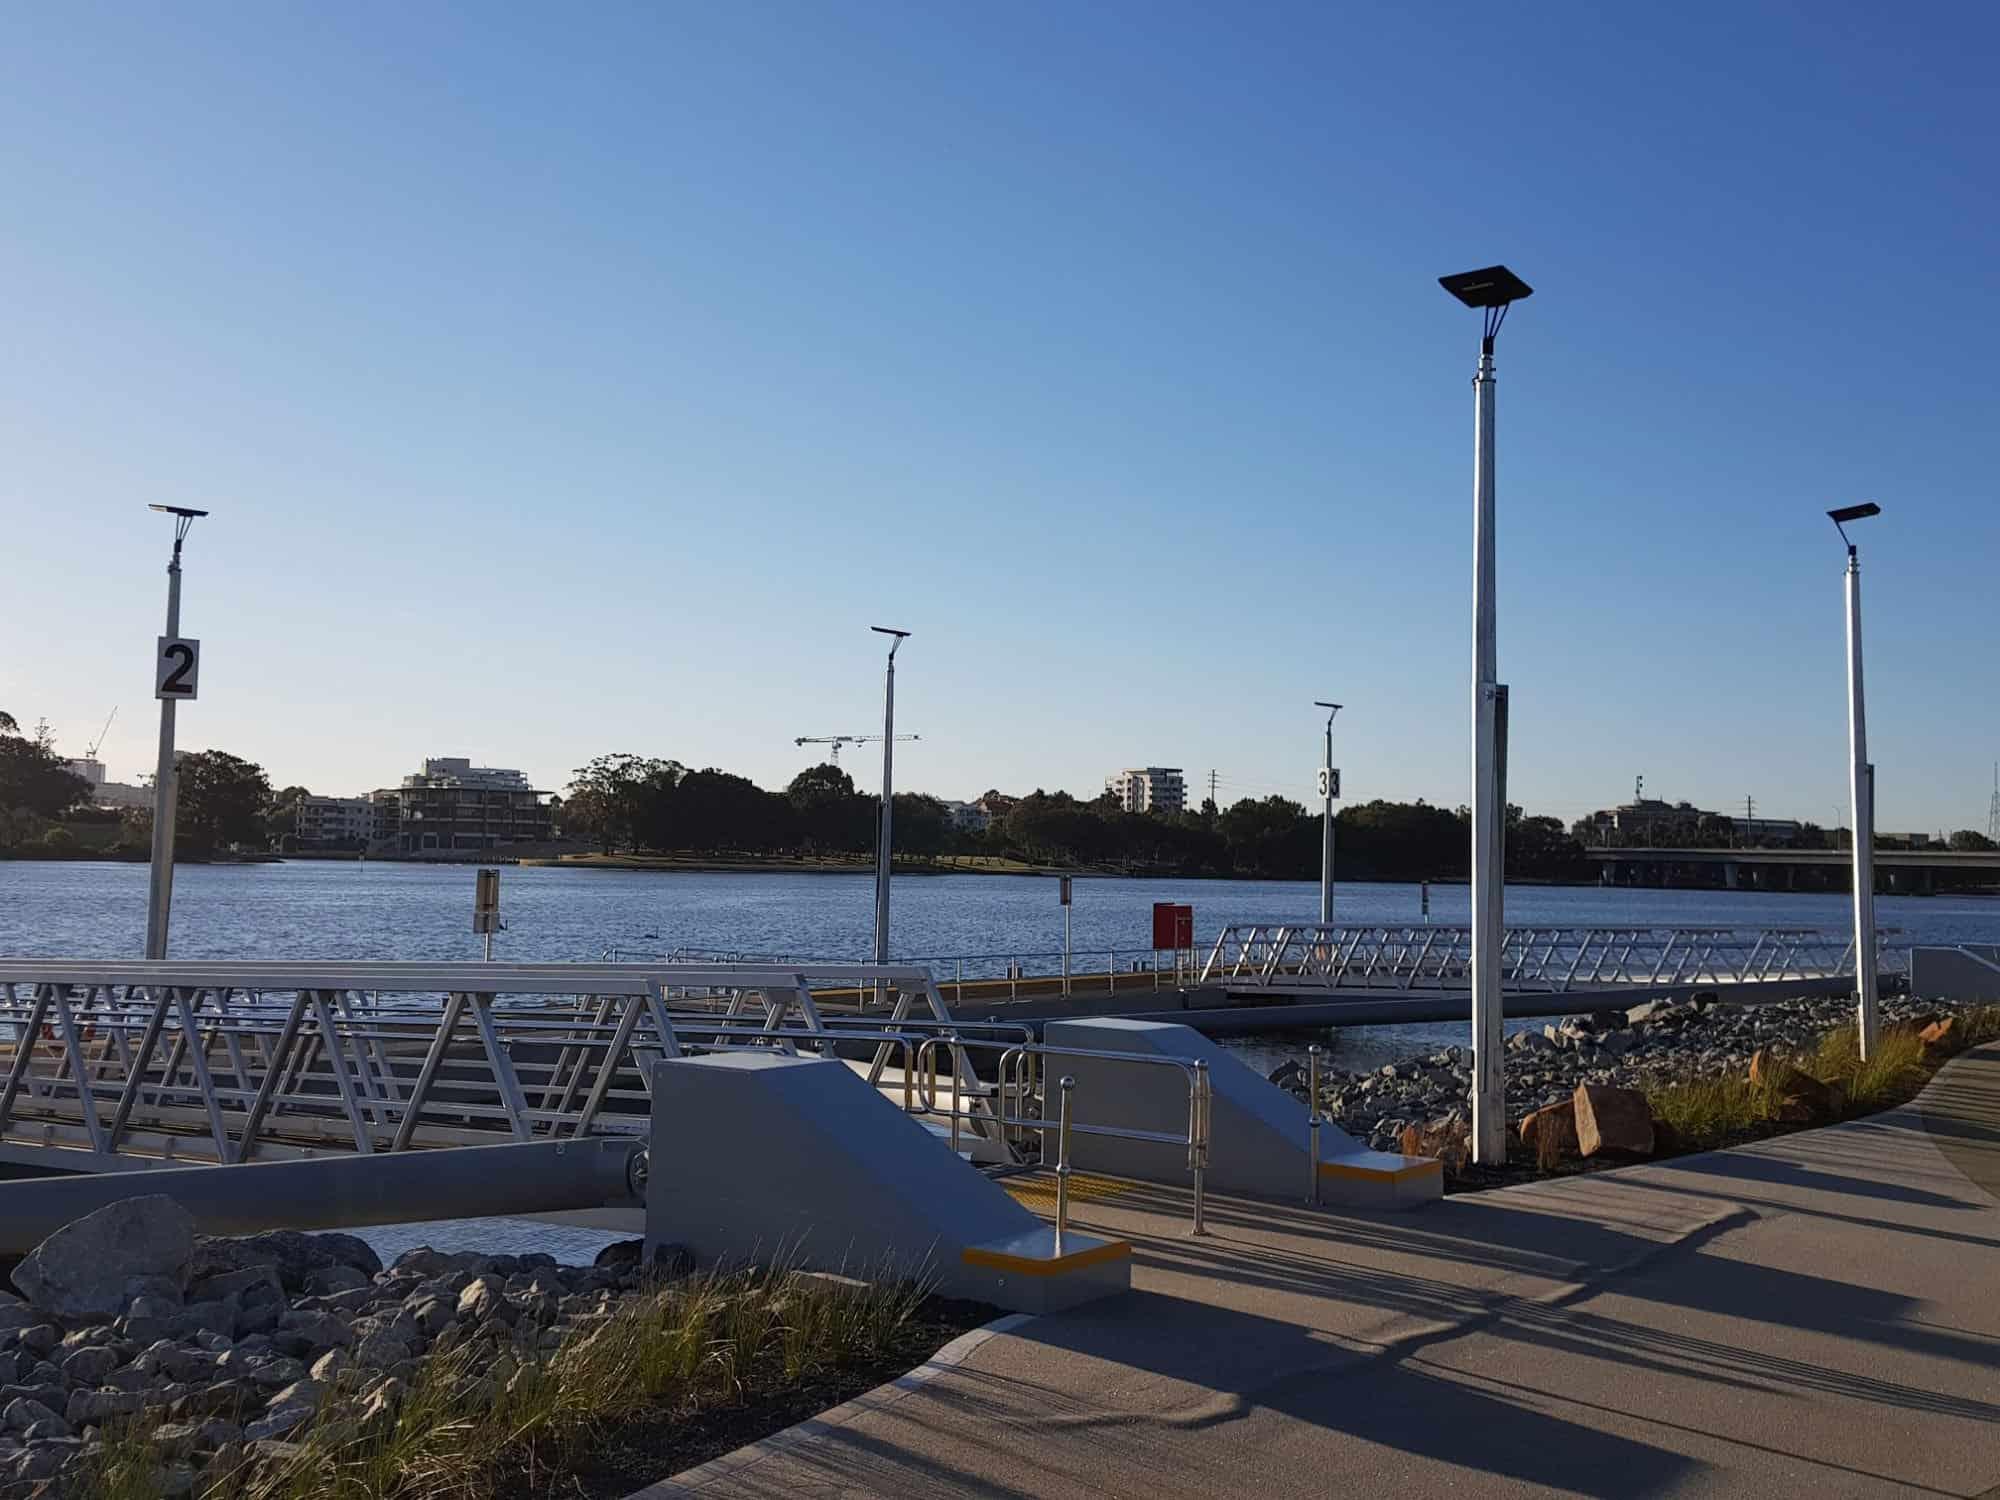 burswood-jetty-perth-stadium